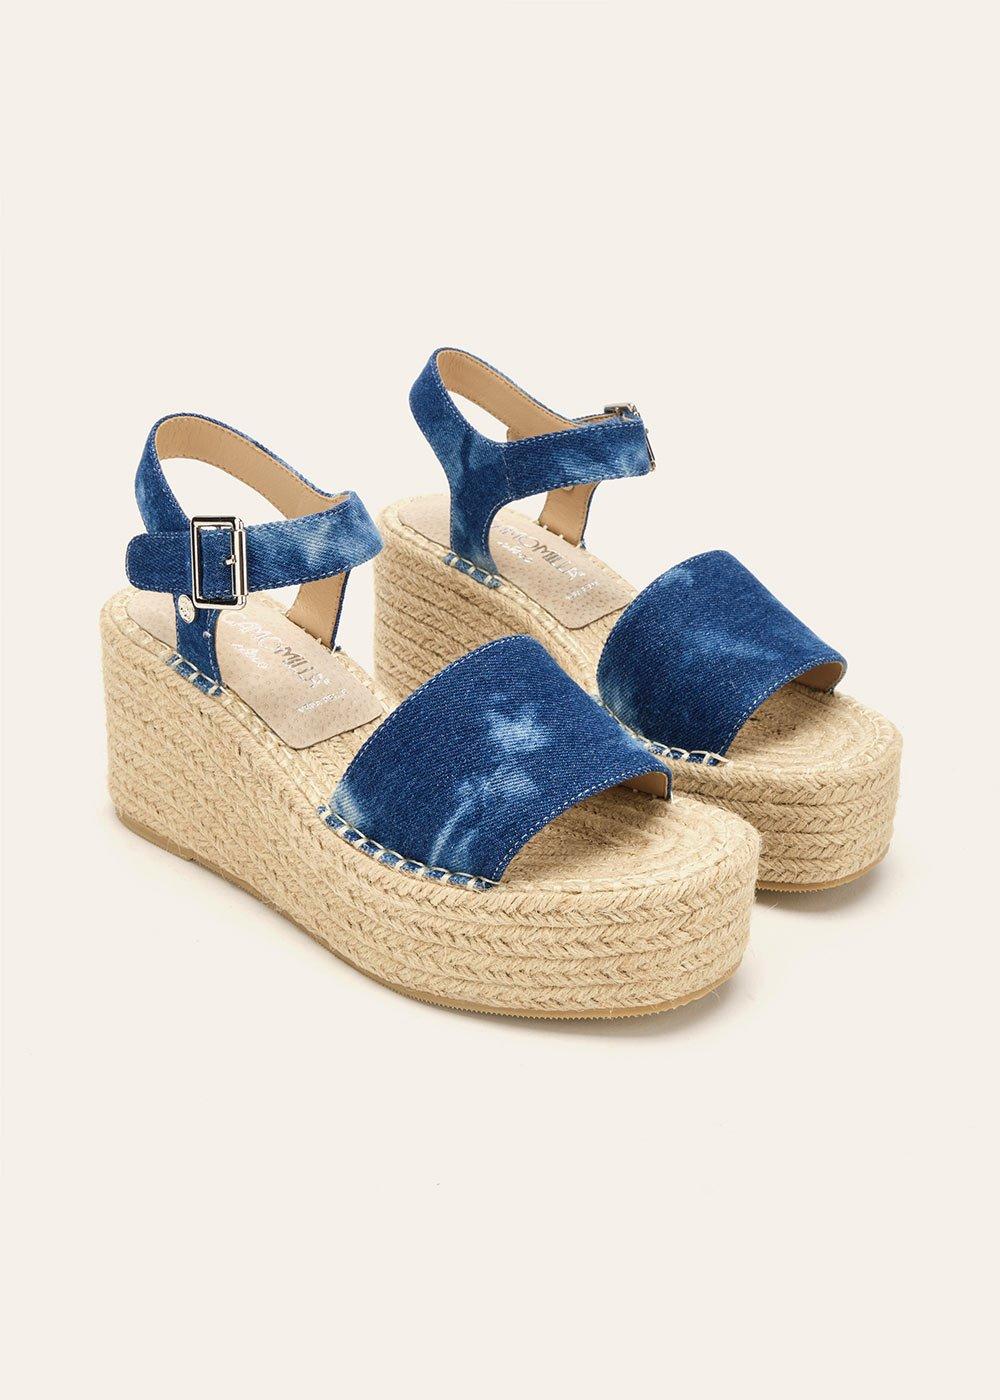 Sher denim sandal - Medium Denim - Woman